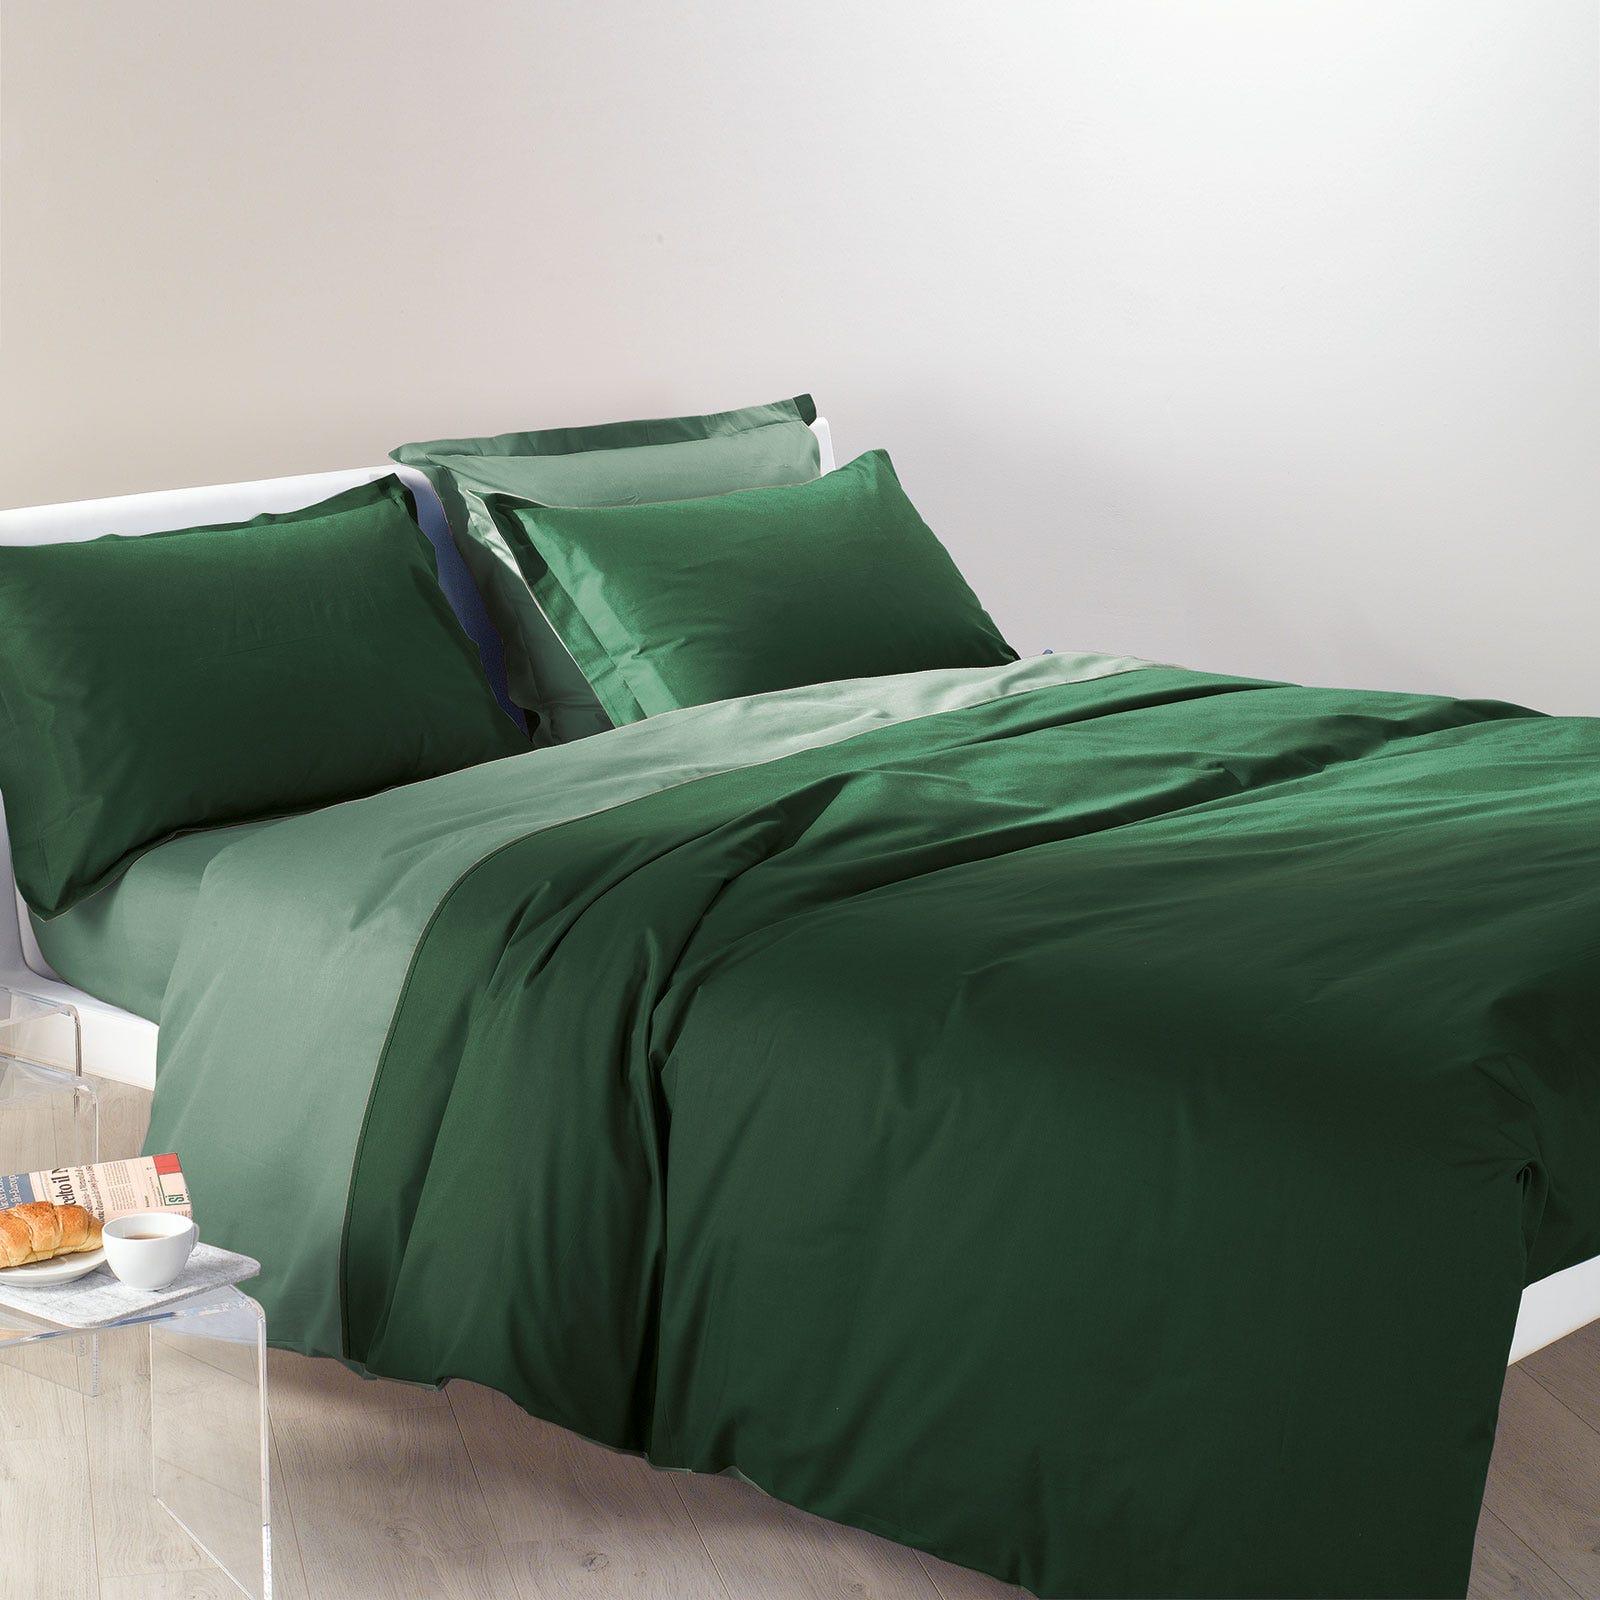 Caleffi Copripiumino Matrimoniale Bicolor Verde in Cotone